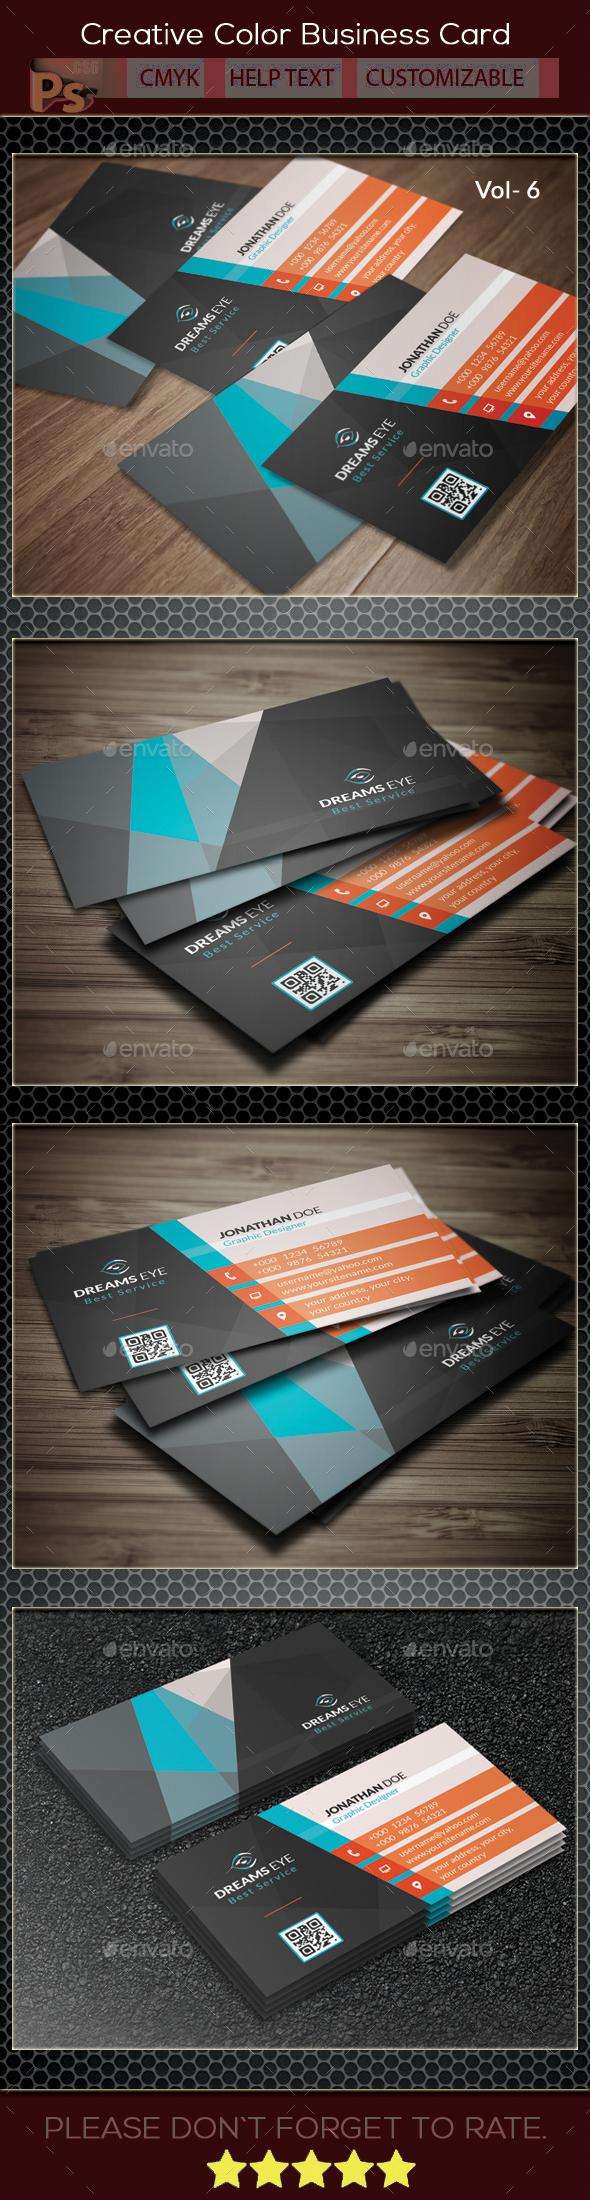 Creative Color Business Card V.6